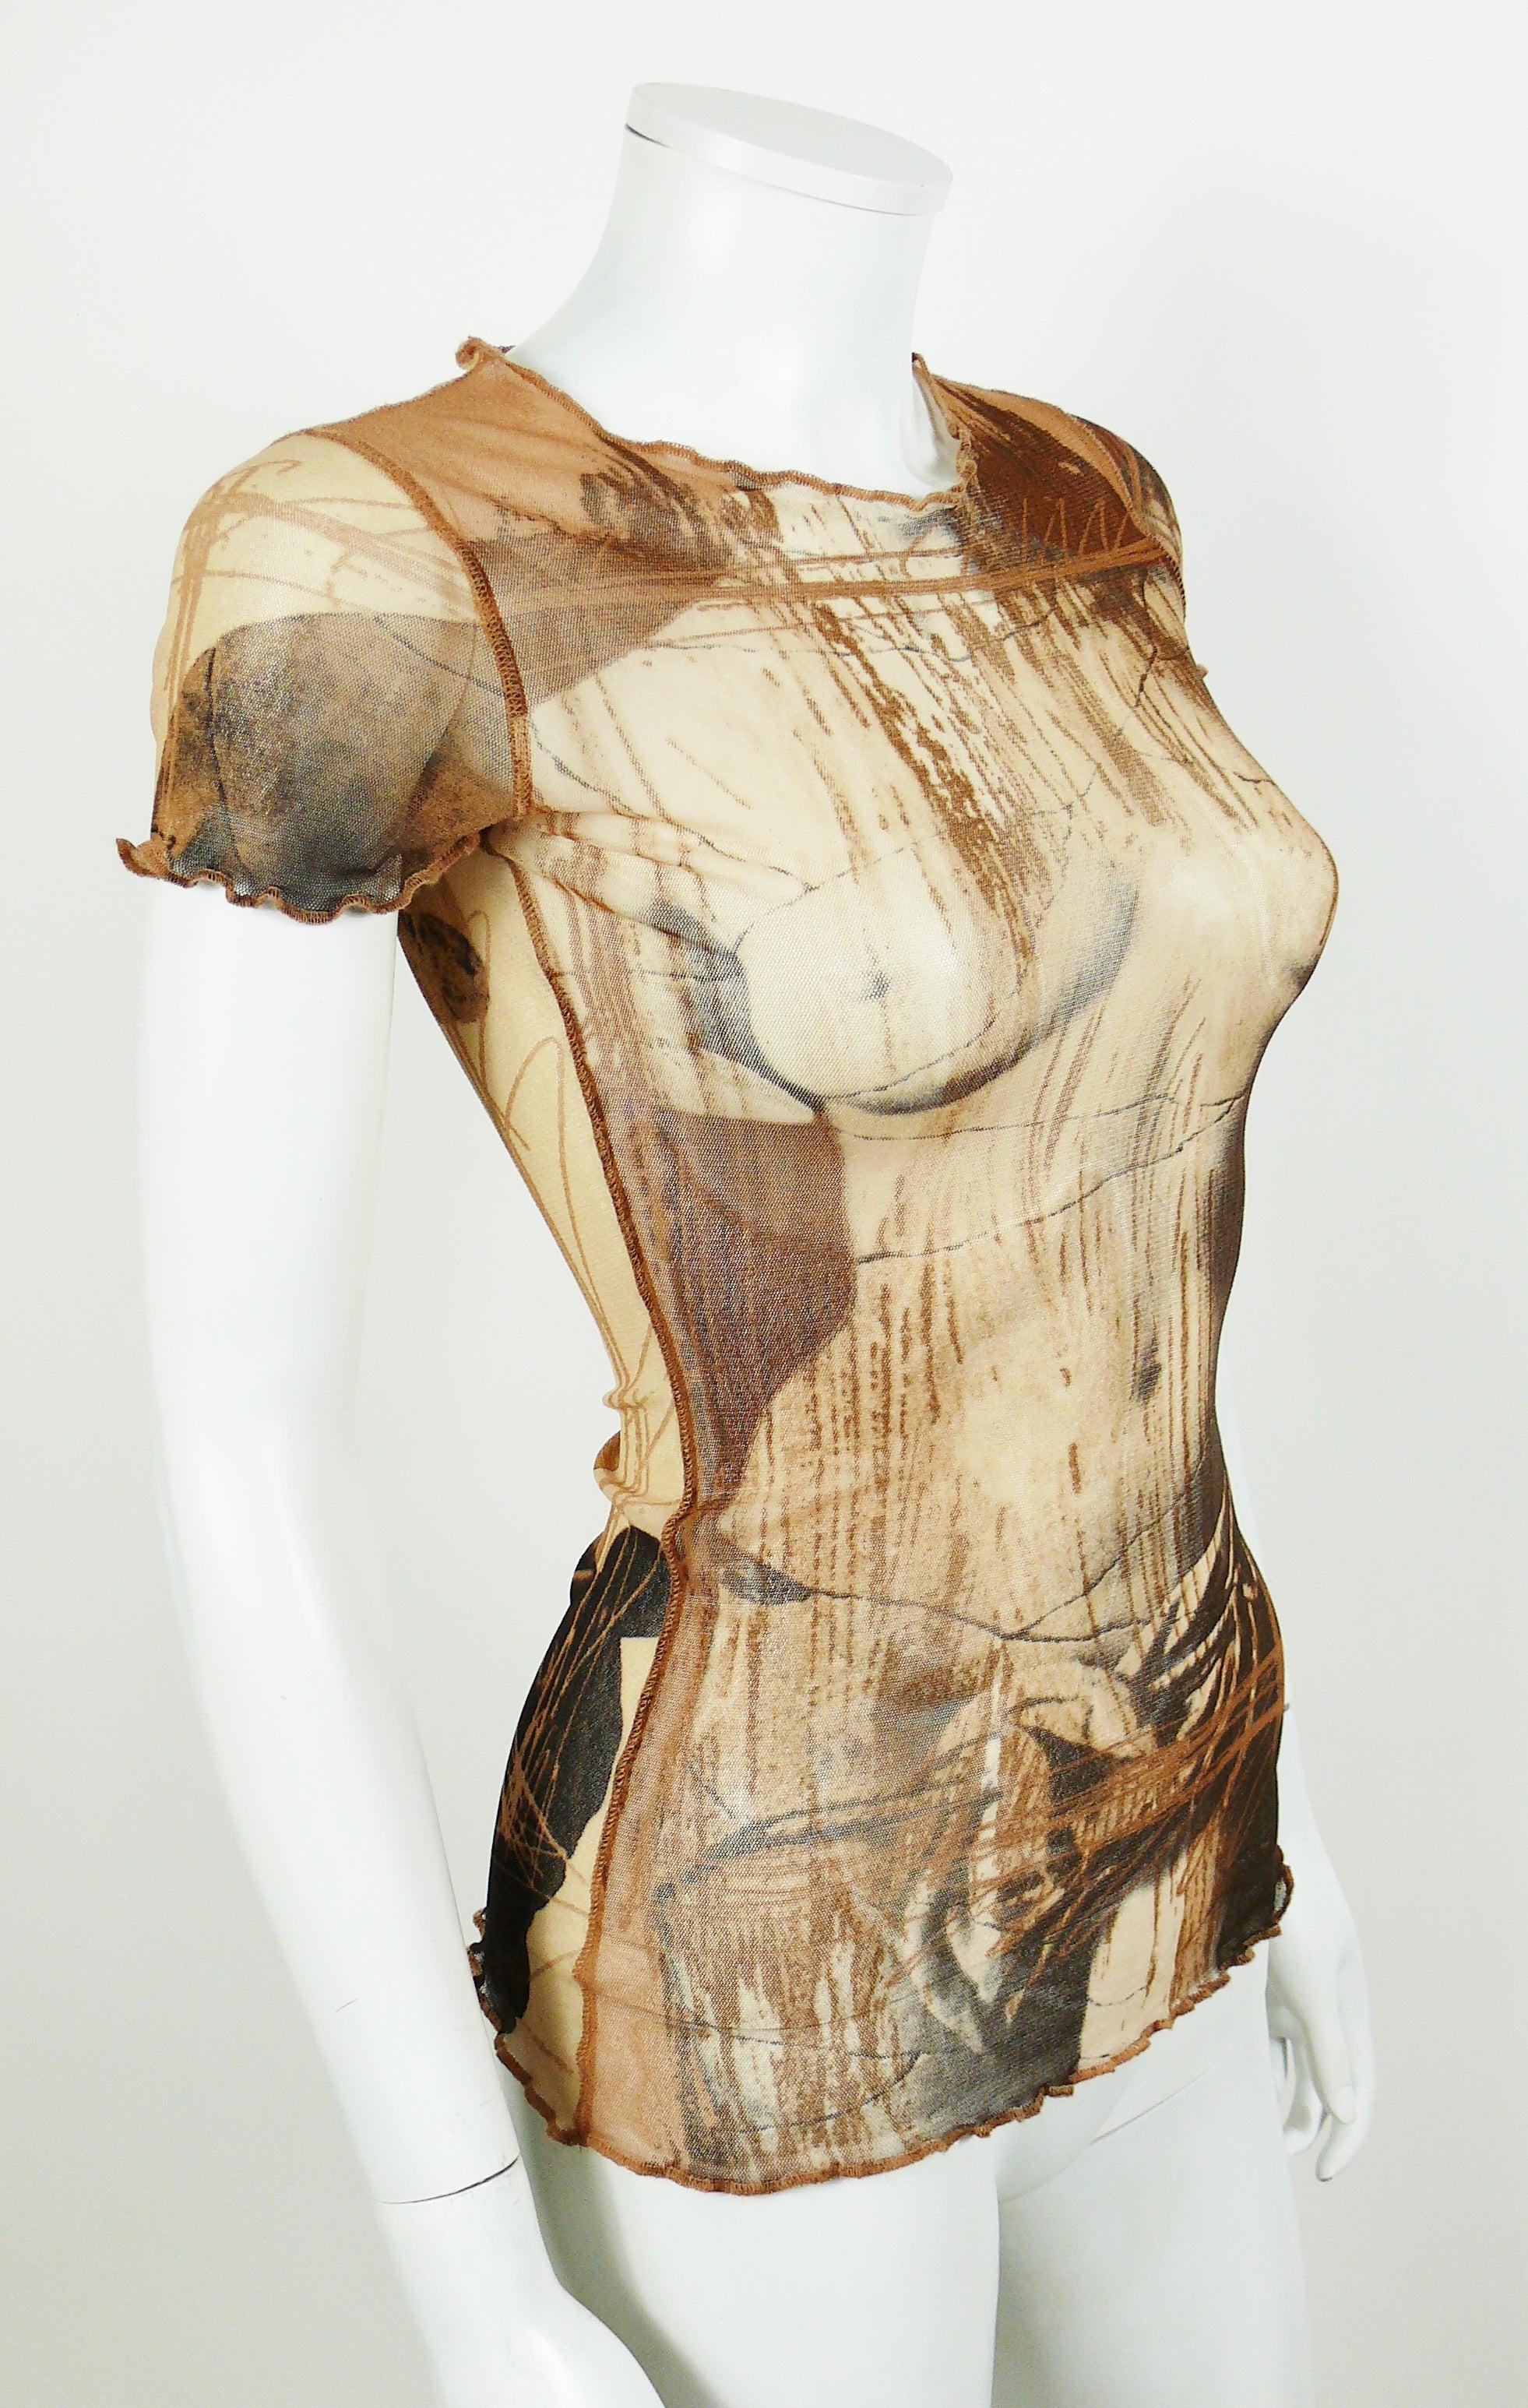 c11c9b29dcc Jean Paul Gaultier Vintage Venus de Milo Sheer Mesh Top at 1stdibs